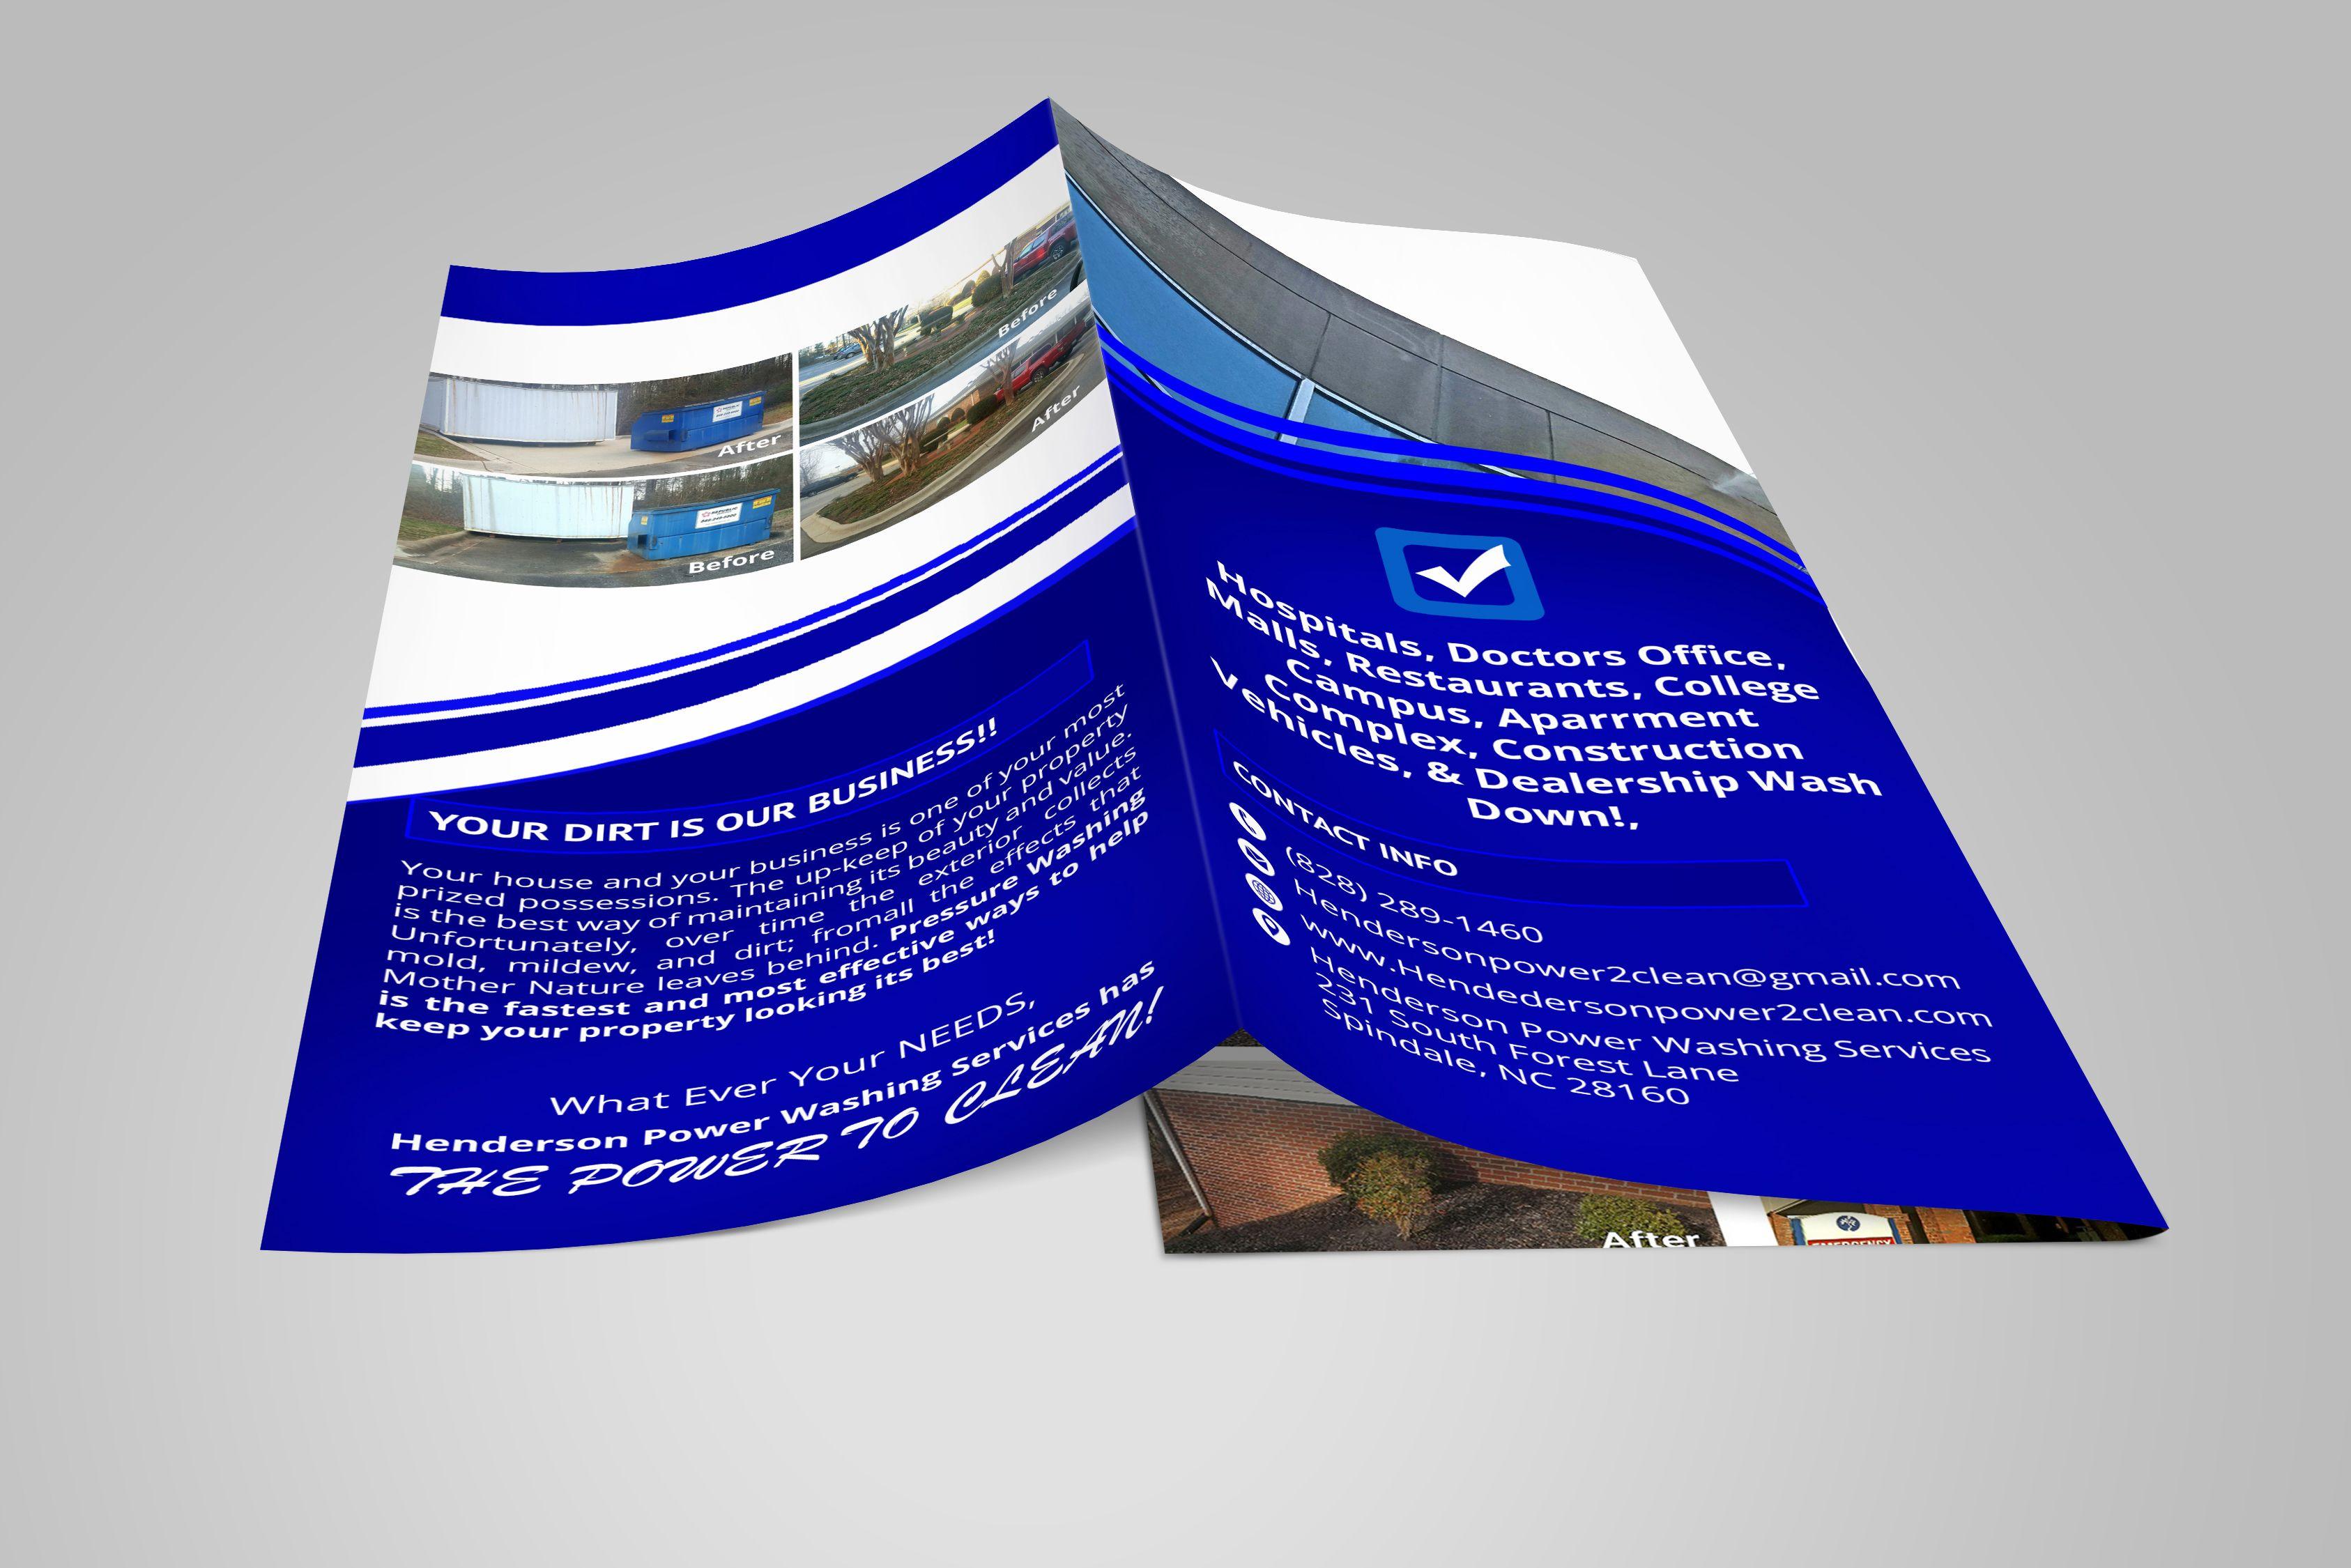 11x17 tri fold brochure 85 x 11 trifold brochure template a4 trifold brochure mockup template blank tri fold brochure template creating a trifold